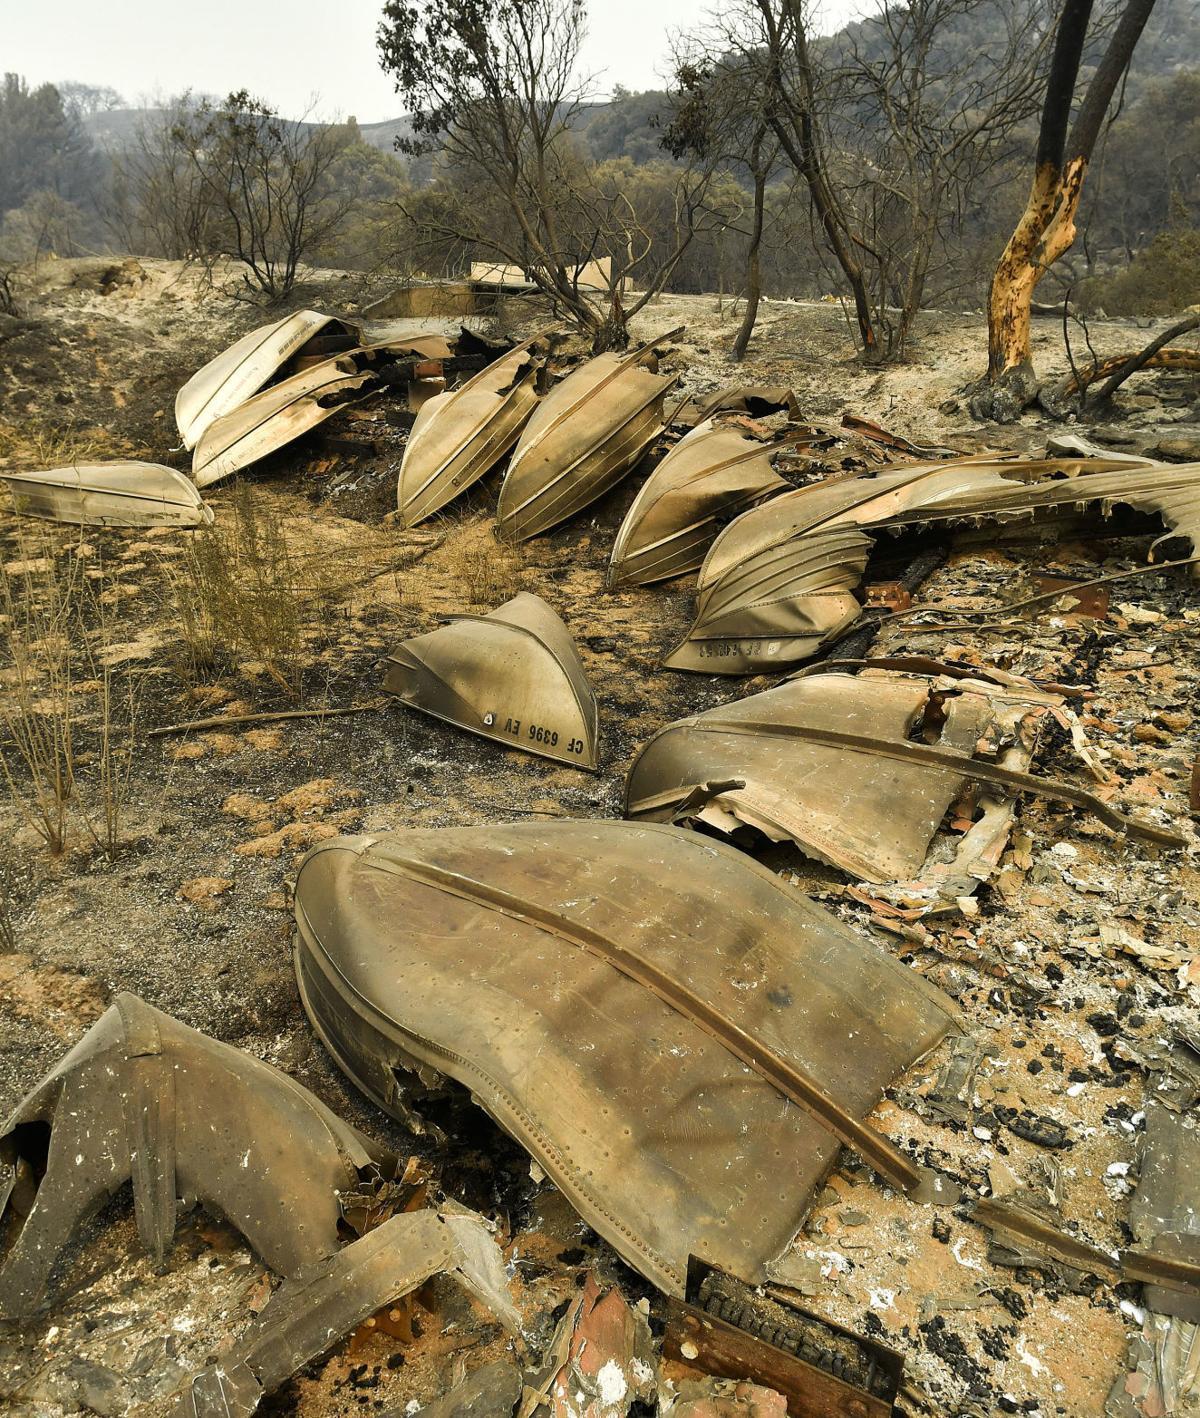 070717 Rancho Alegre's melted boats